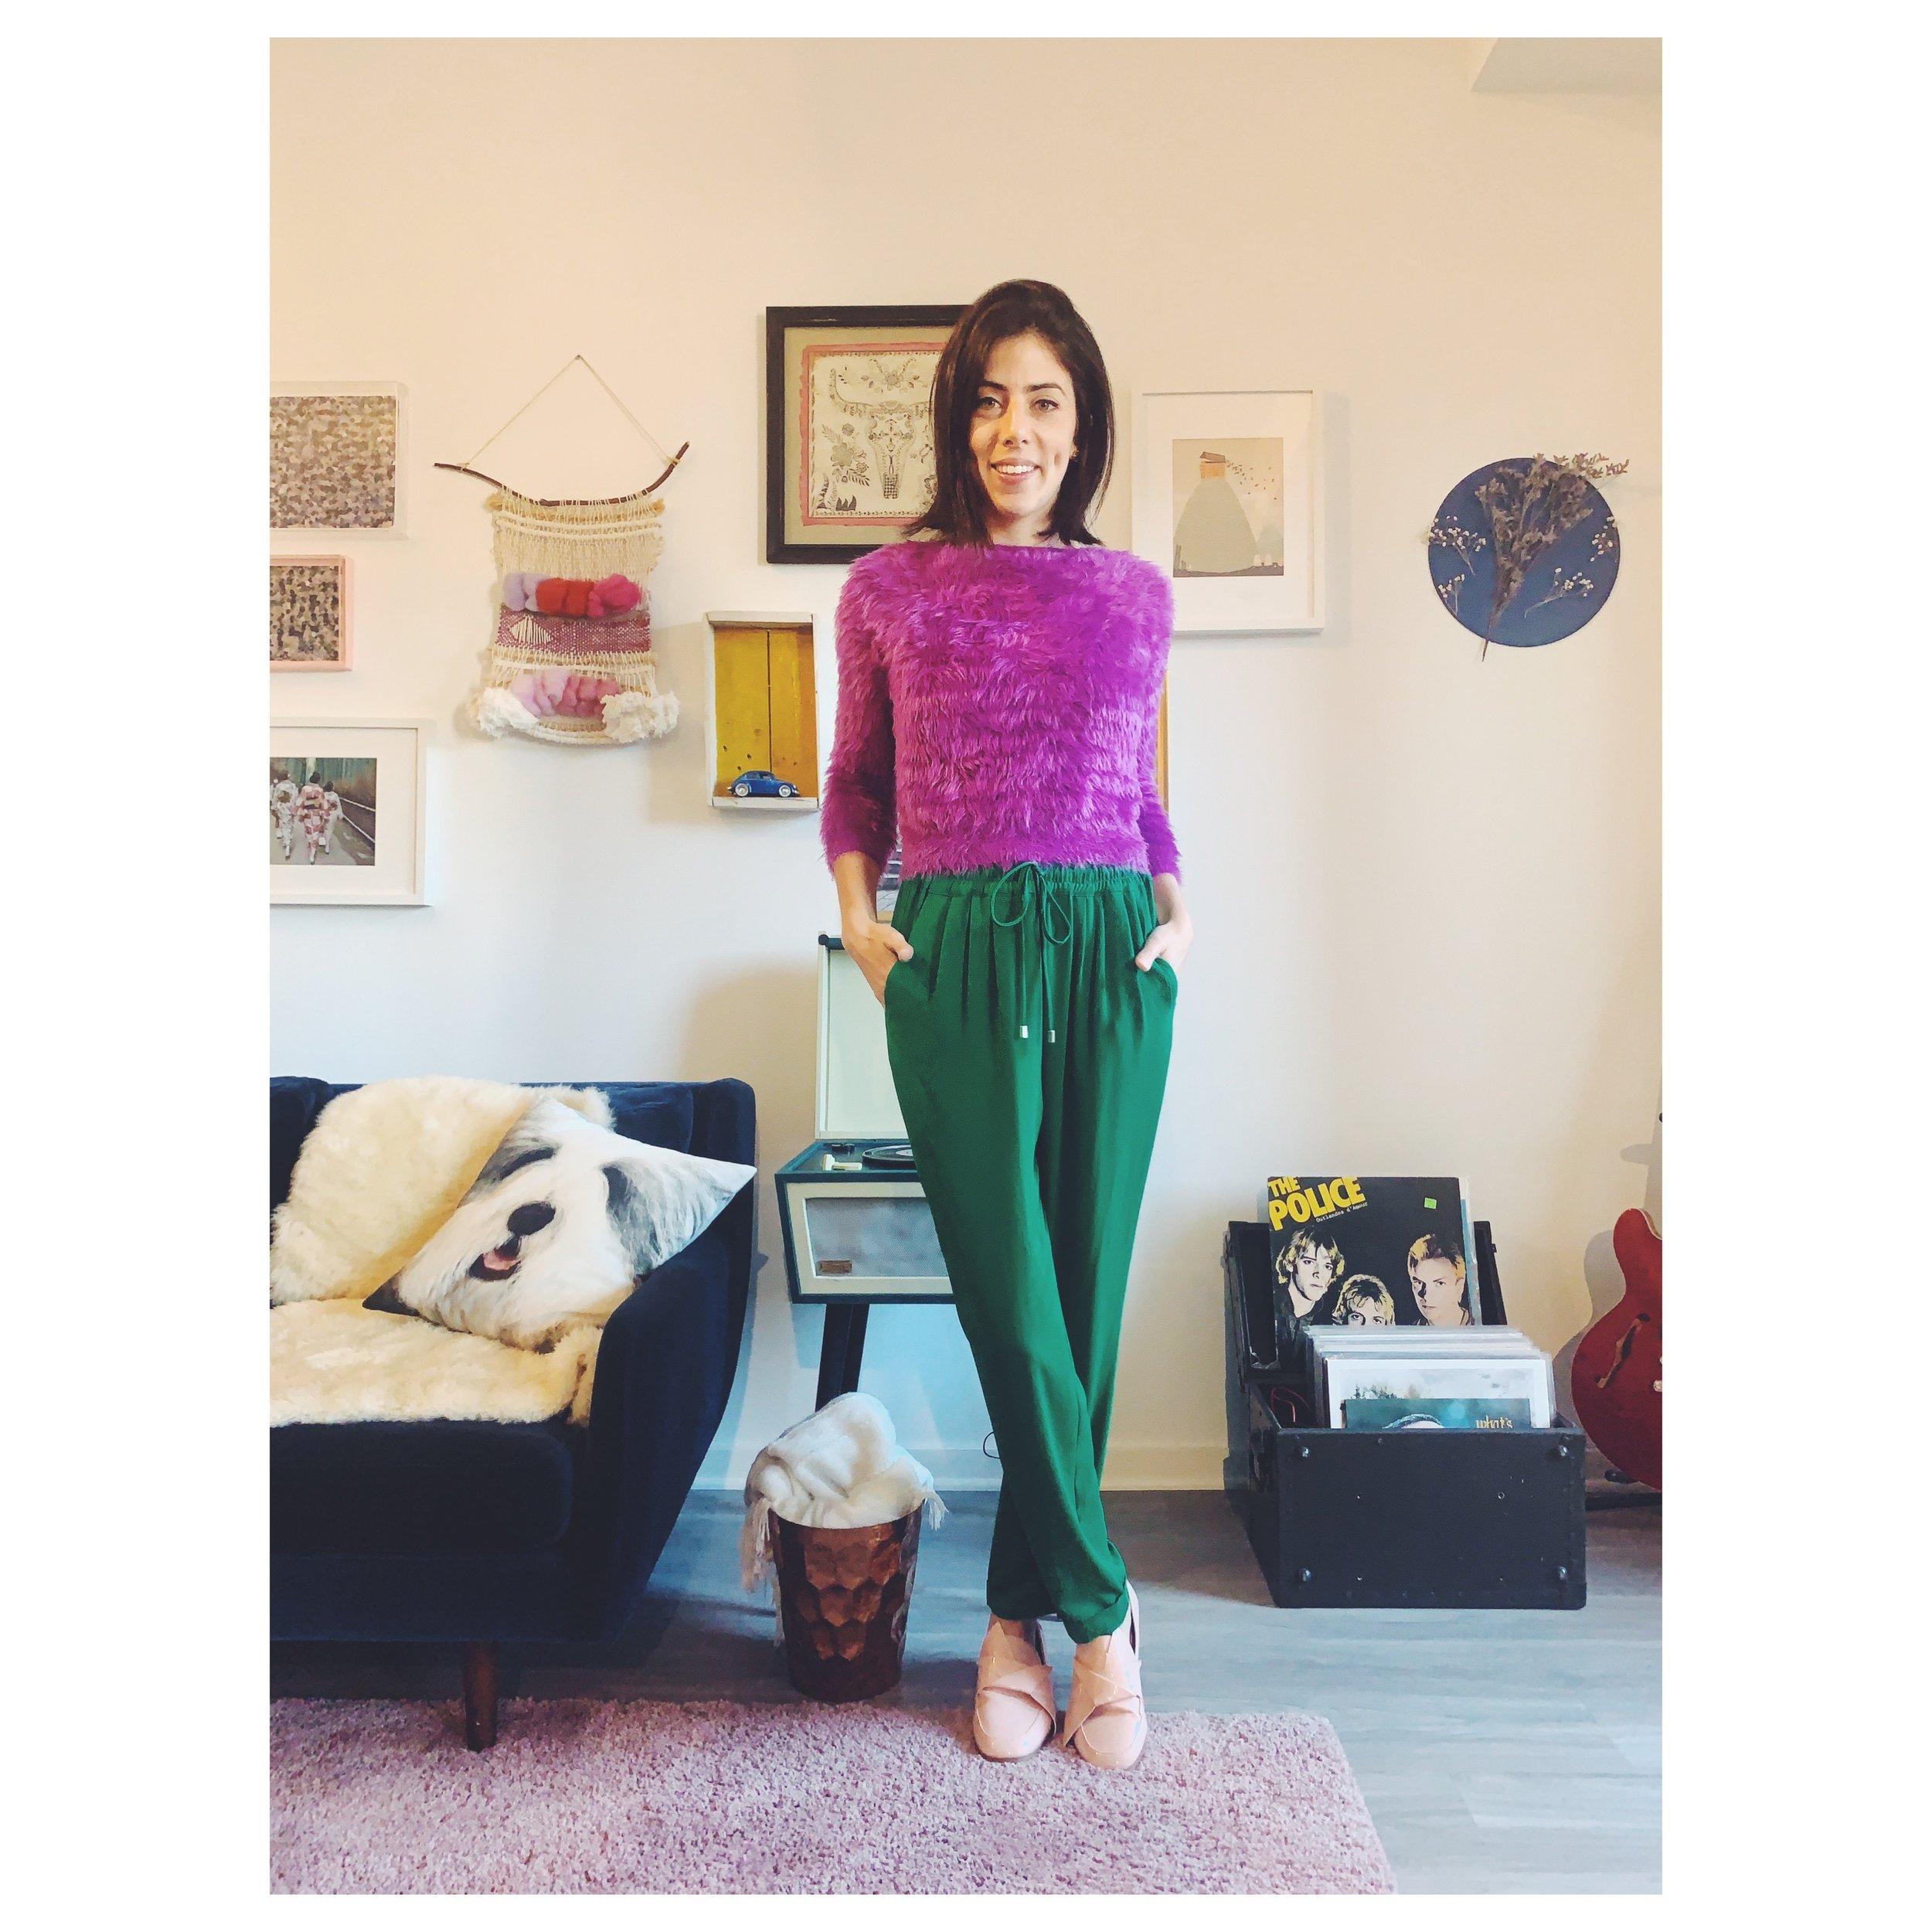 Blusa rosa pelinho - Instagram 2.JPG